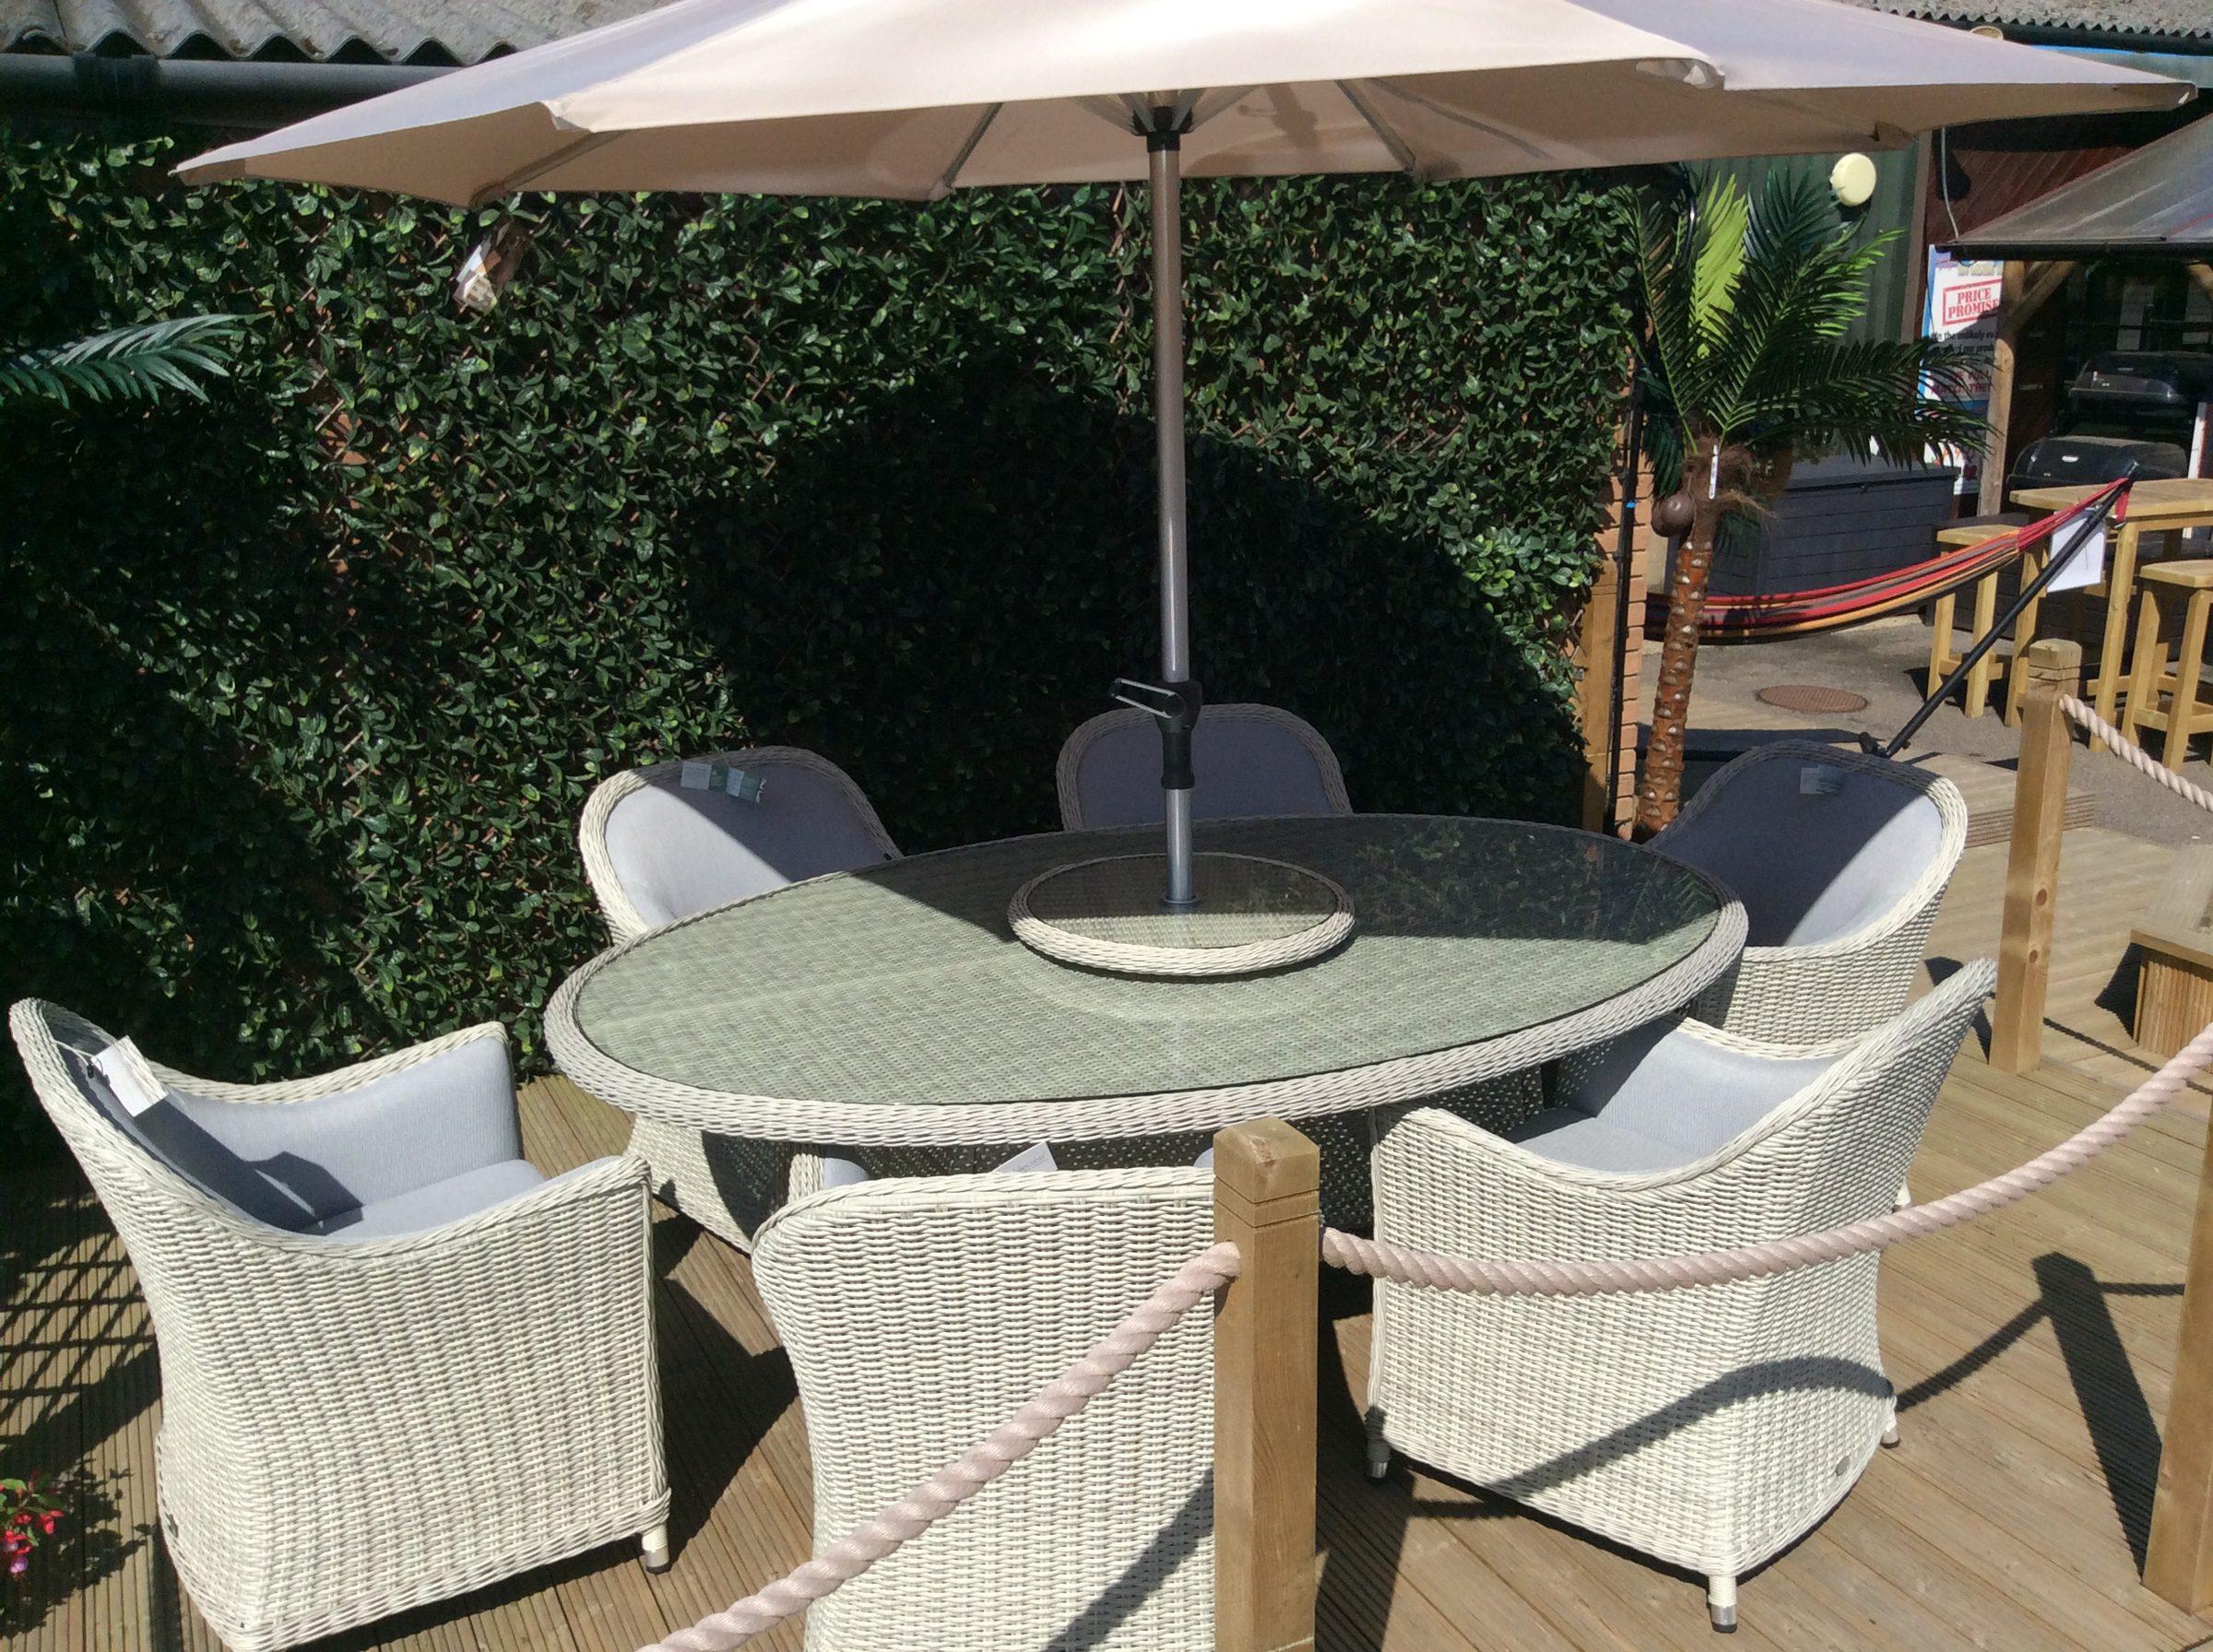 Bramblecrest Gainsborough 6-Seat Elliptical Dining Set 2018